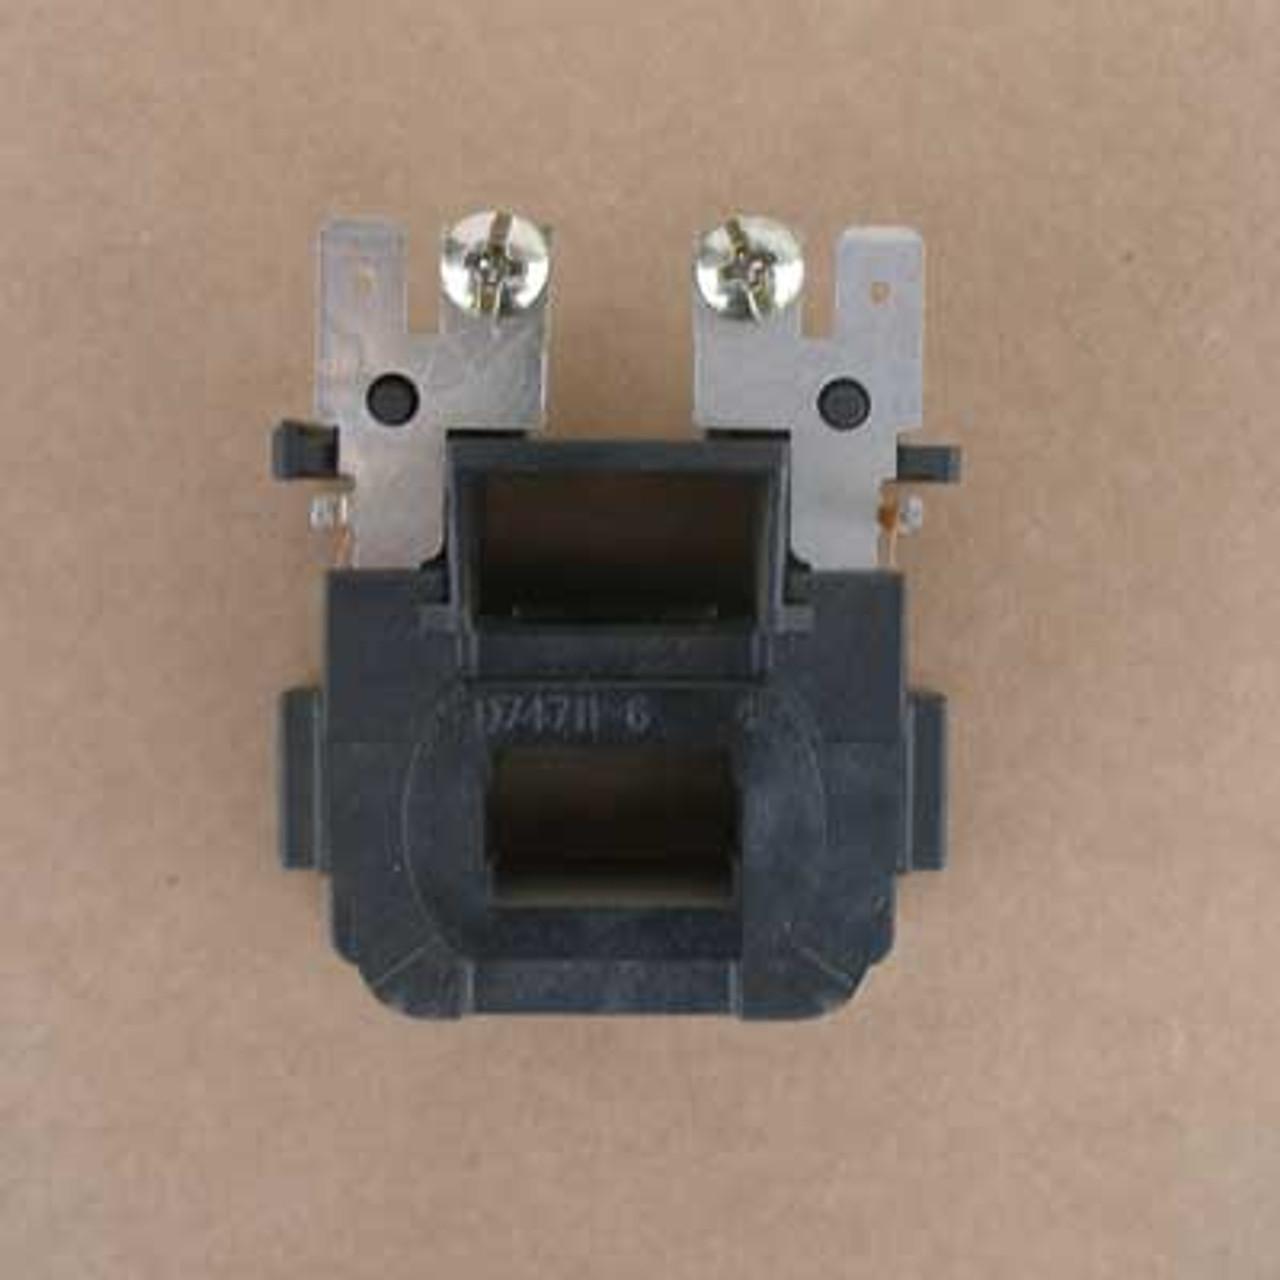 Siemens Furnas 75D70545004 Magnetic Coil 440-480 Volt 60 Hz - New